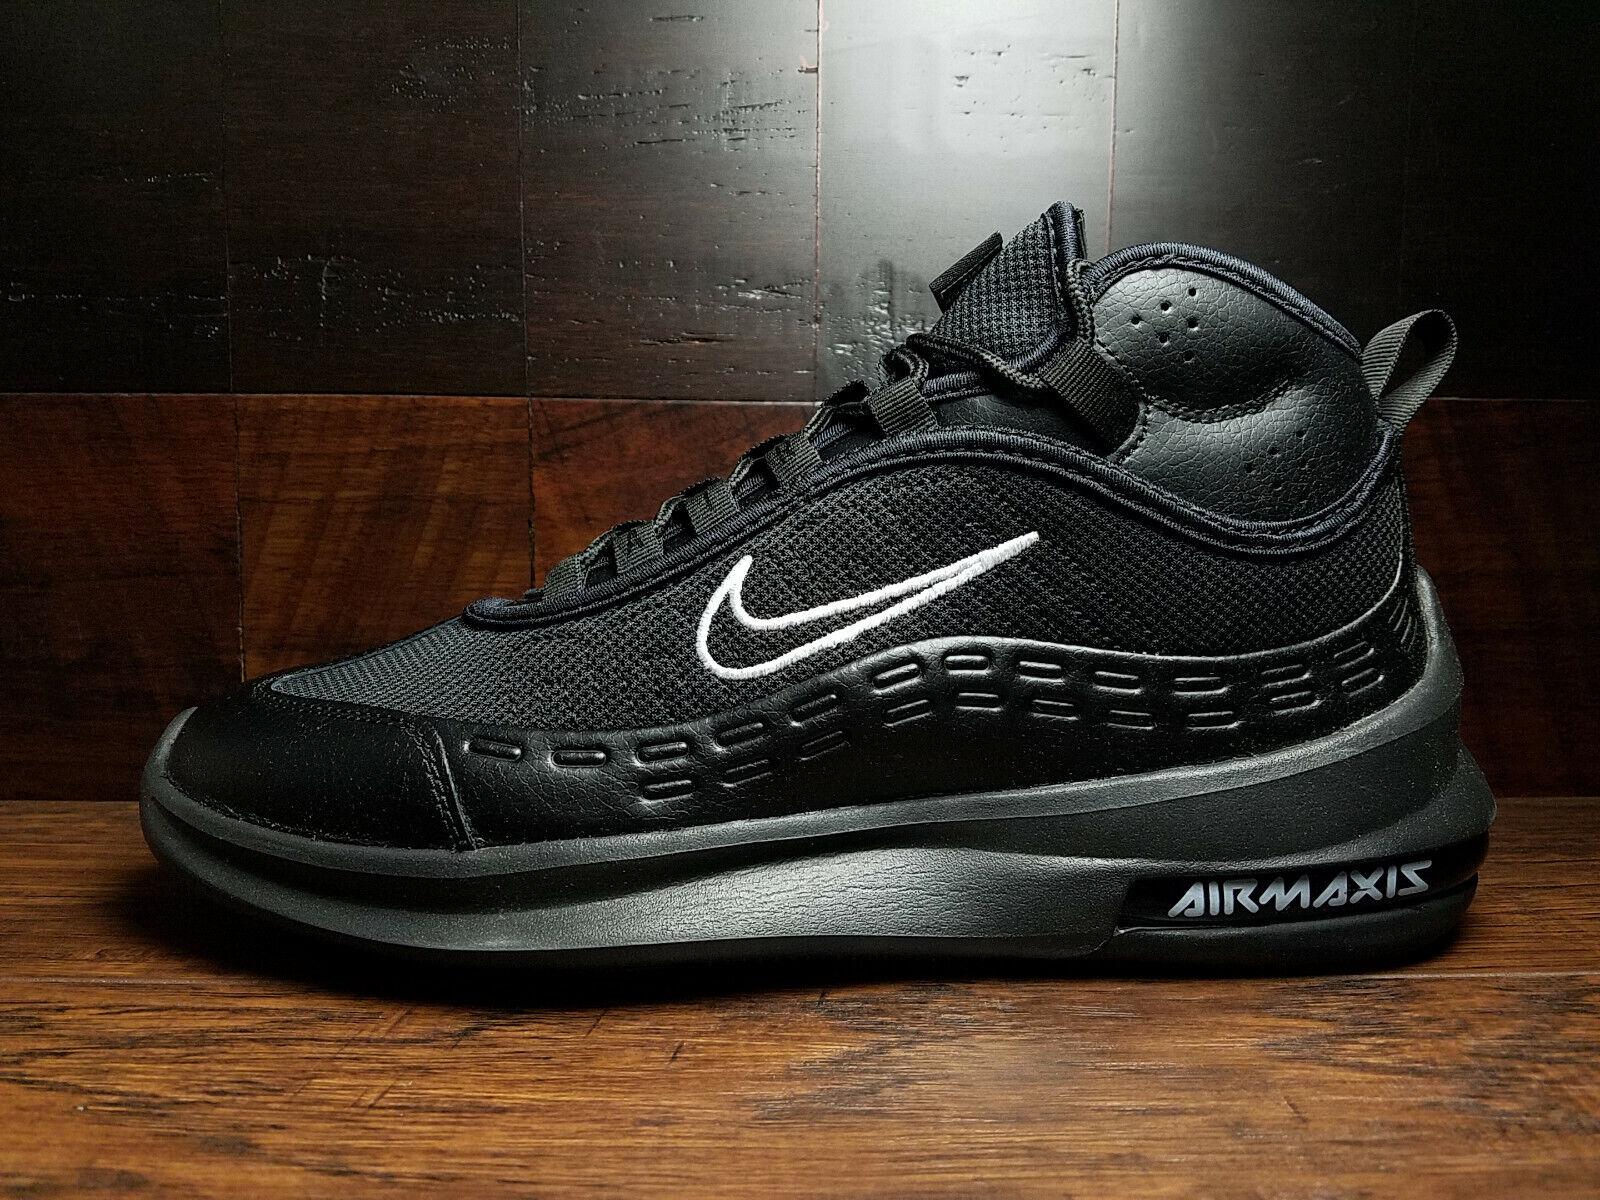 Nike Air Max Axis Mid [BQ4017 002] (Black White) Trainers Mens 8 13